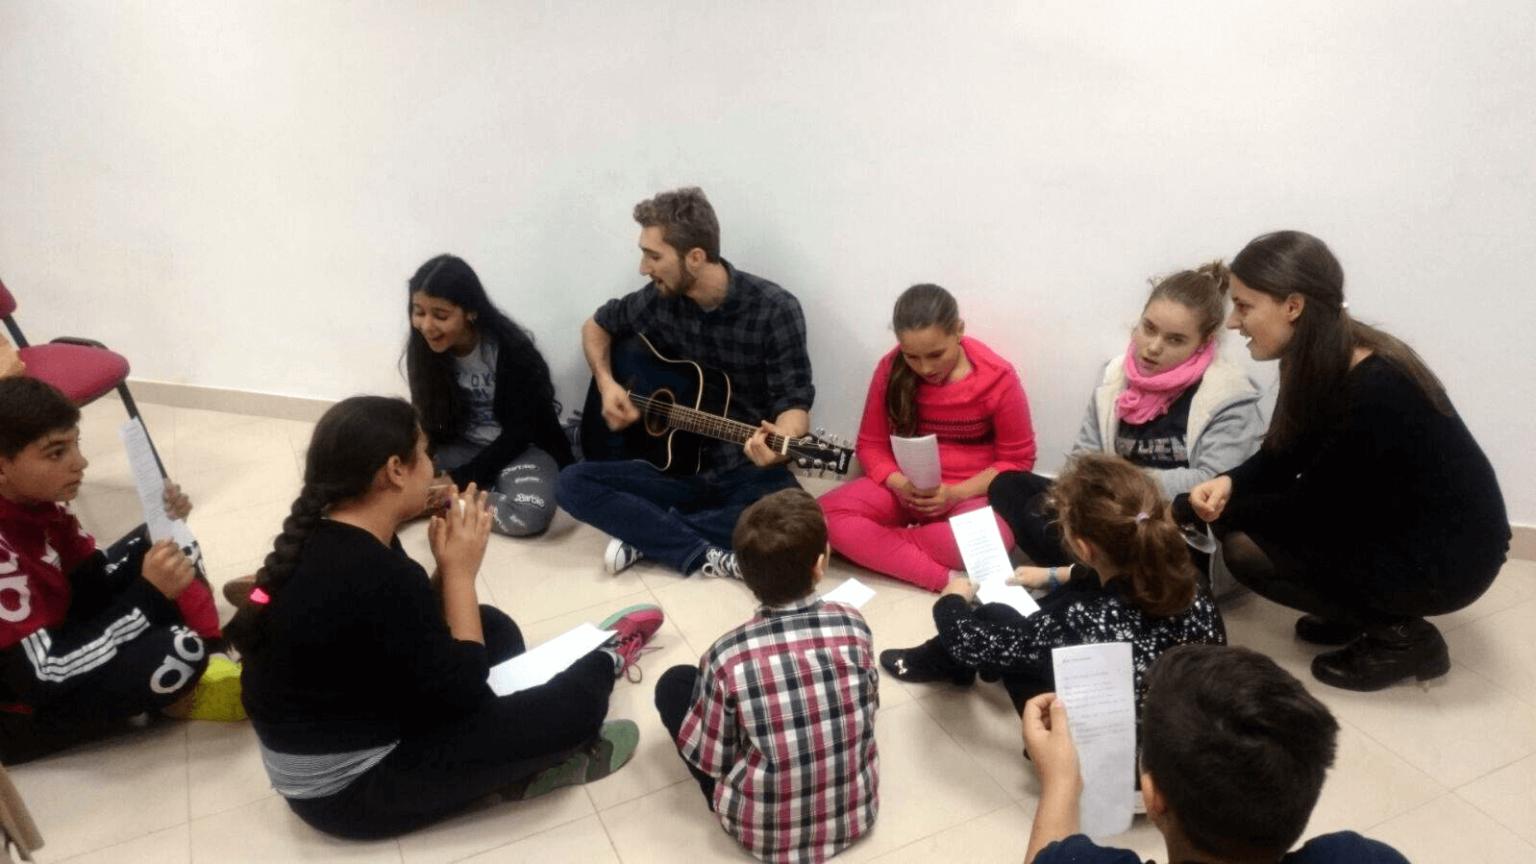 TINERI CRESTINI DUPA EVANGHELIE DIN BISERICA ANTIOHIA IN MISIUNE LA CHITILA